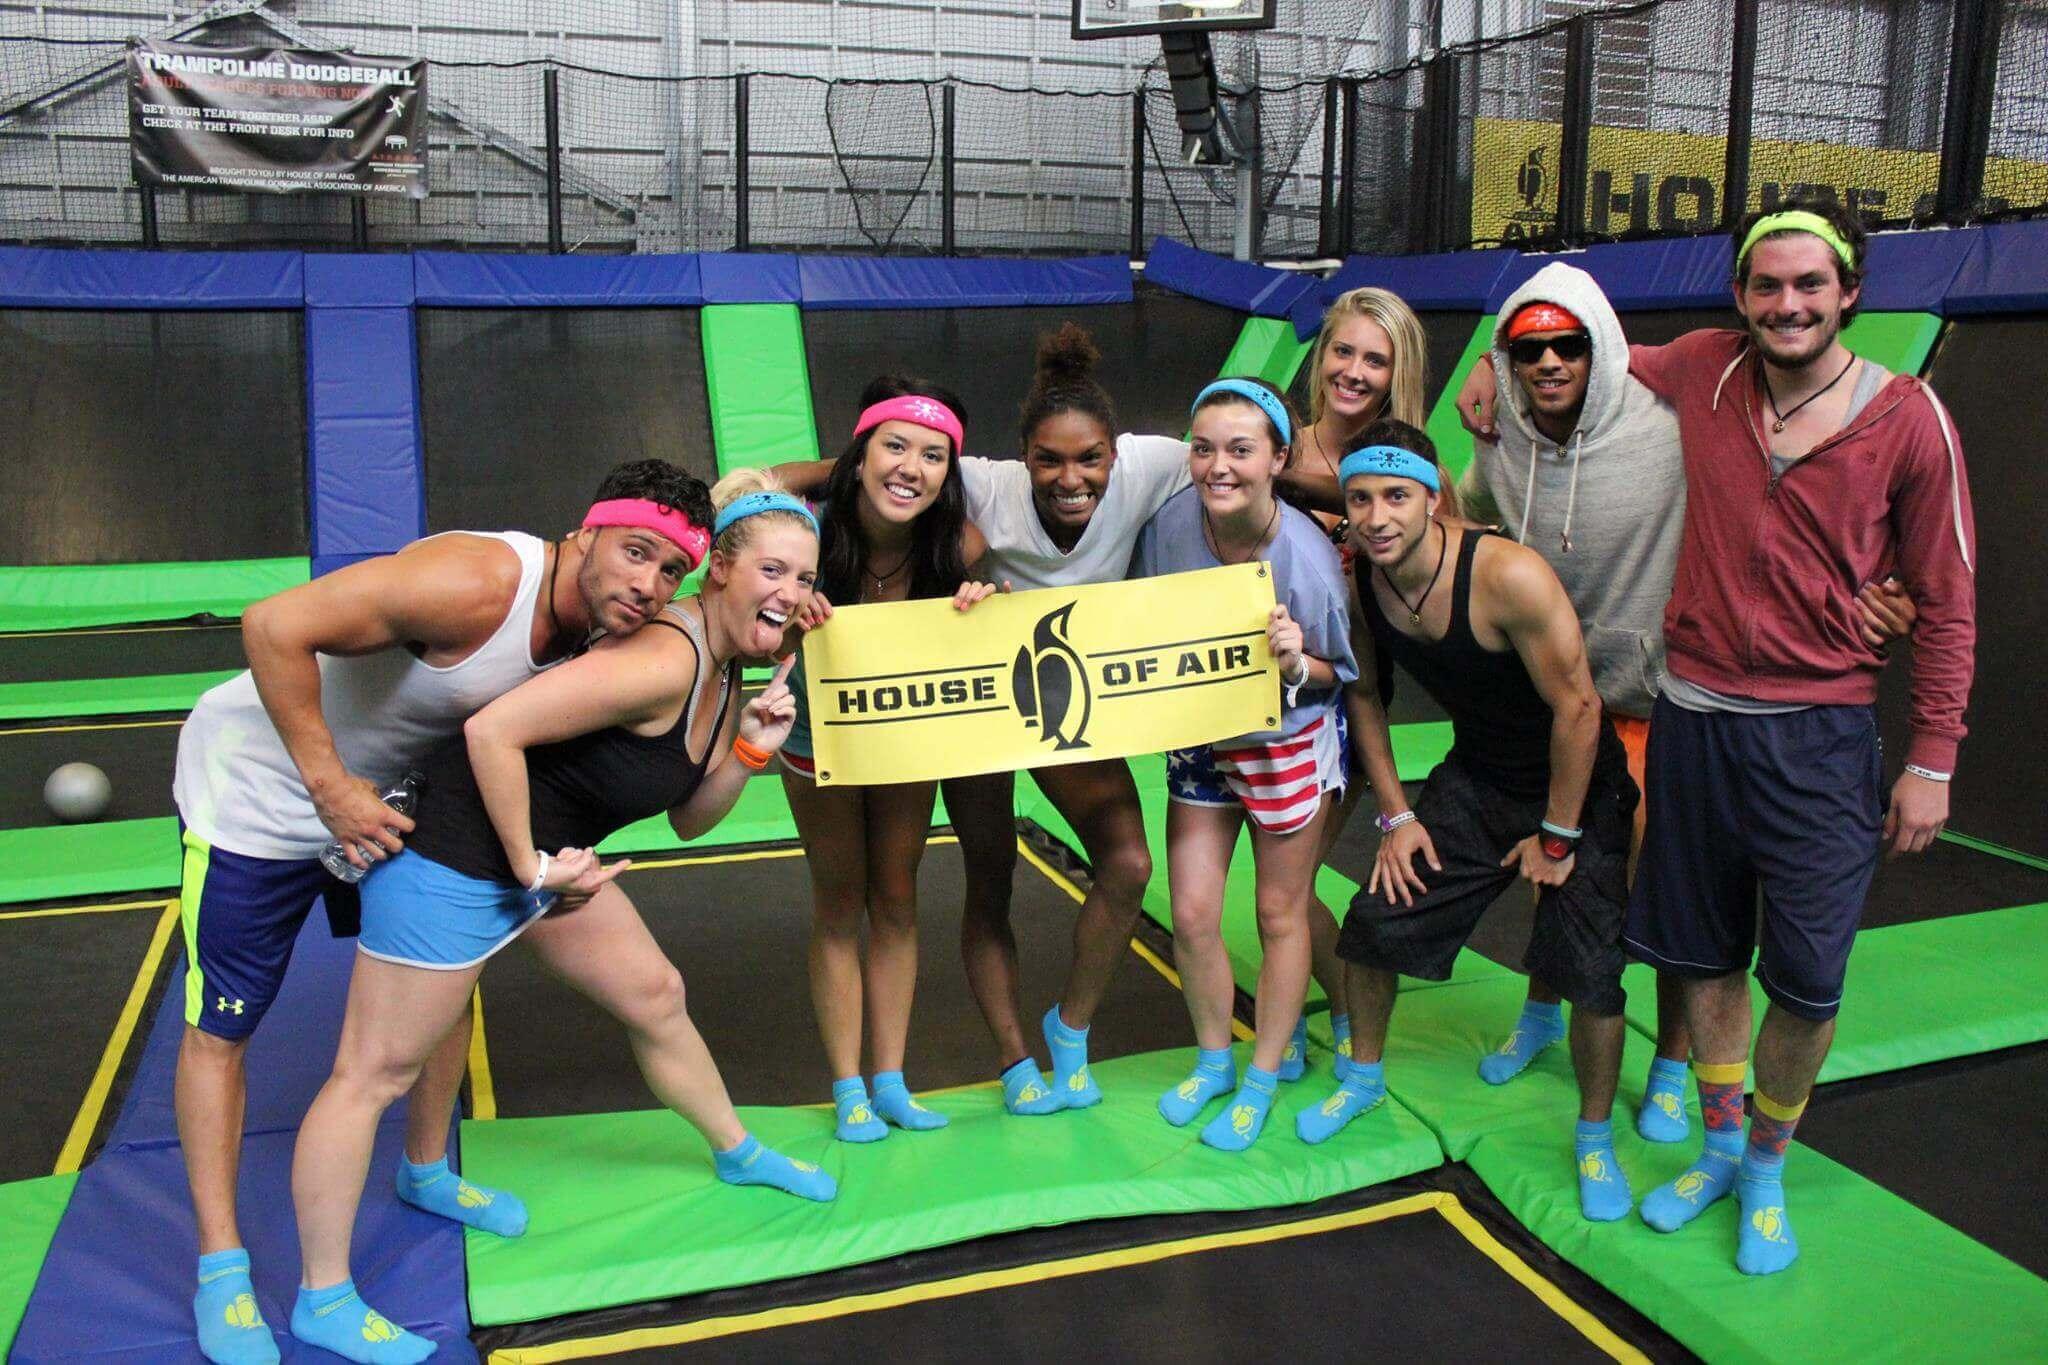 House of Air trampoline park team